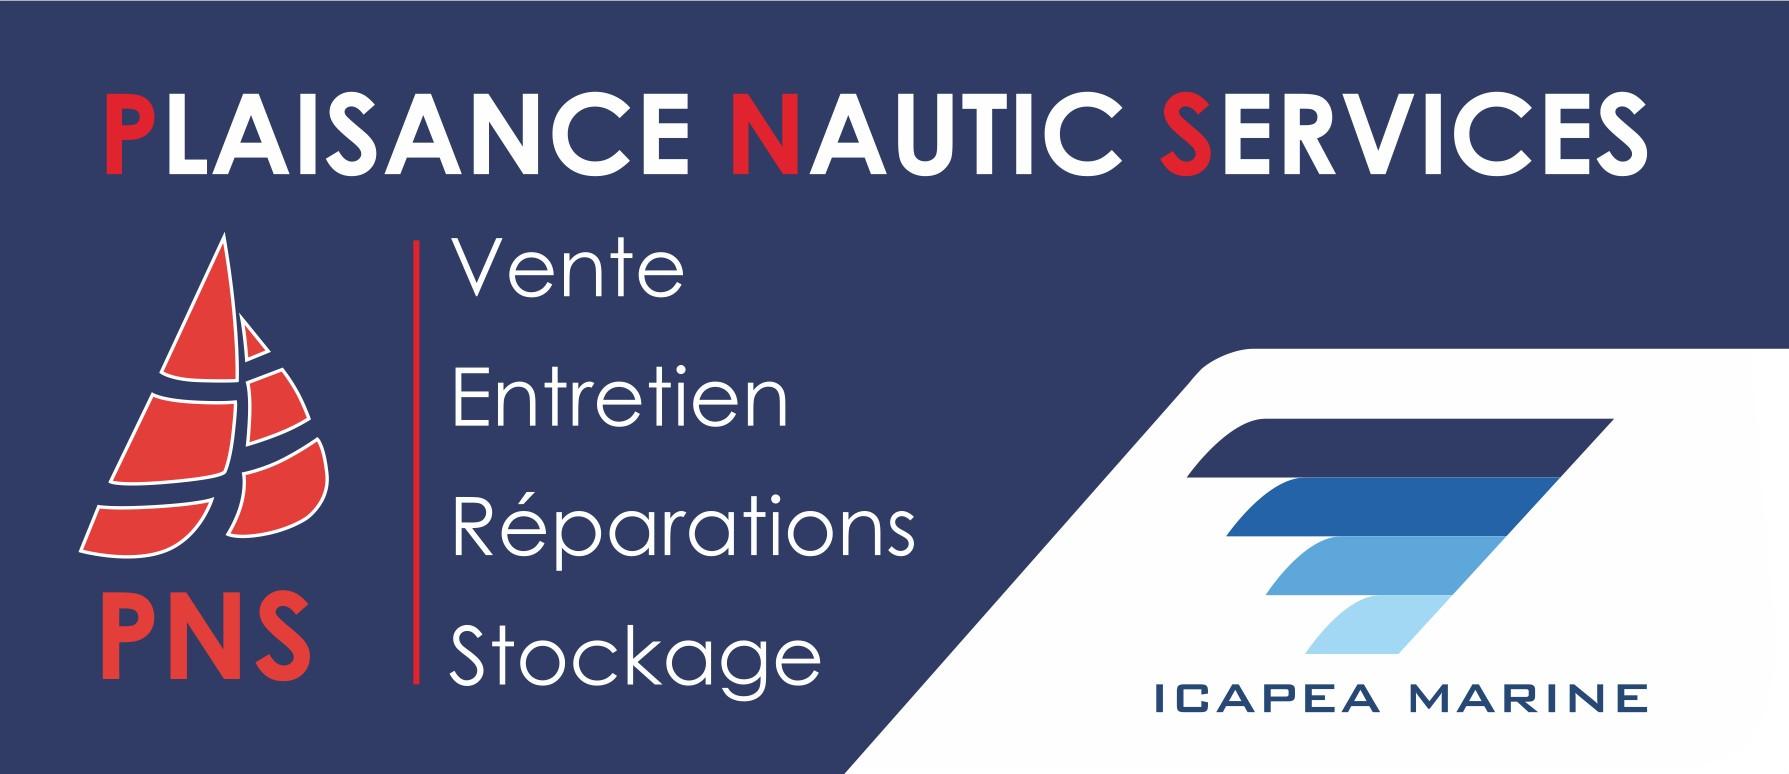 Plaisance Nautic Services / ICAPEA MARINE